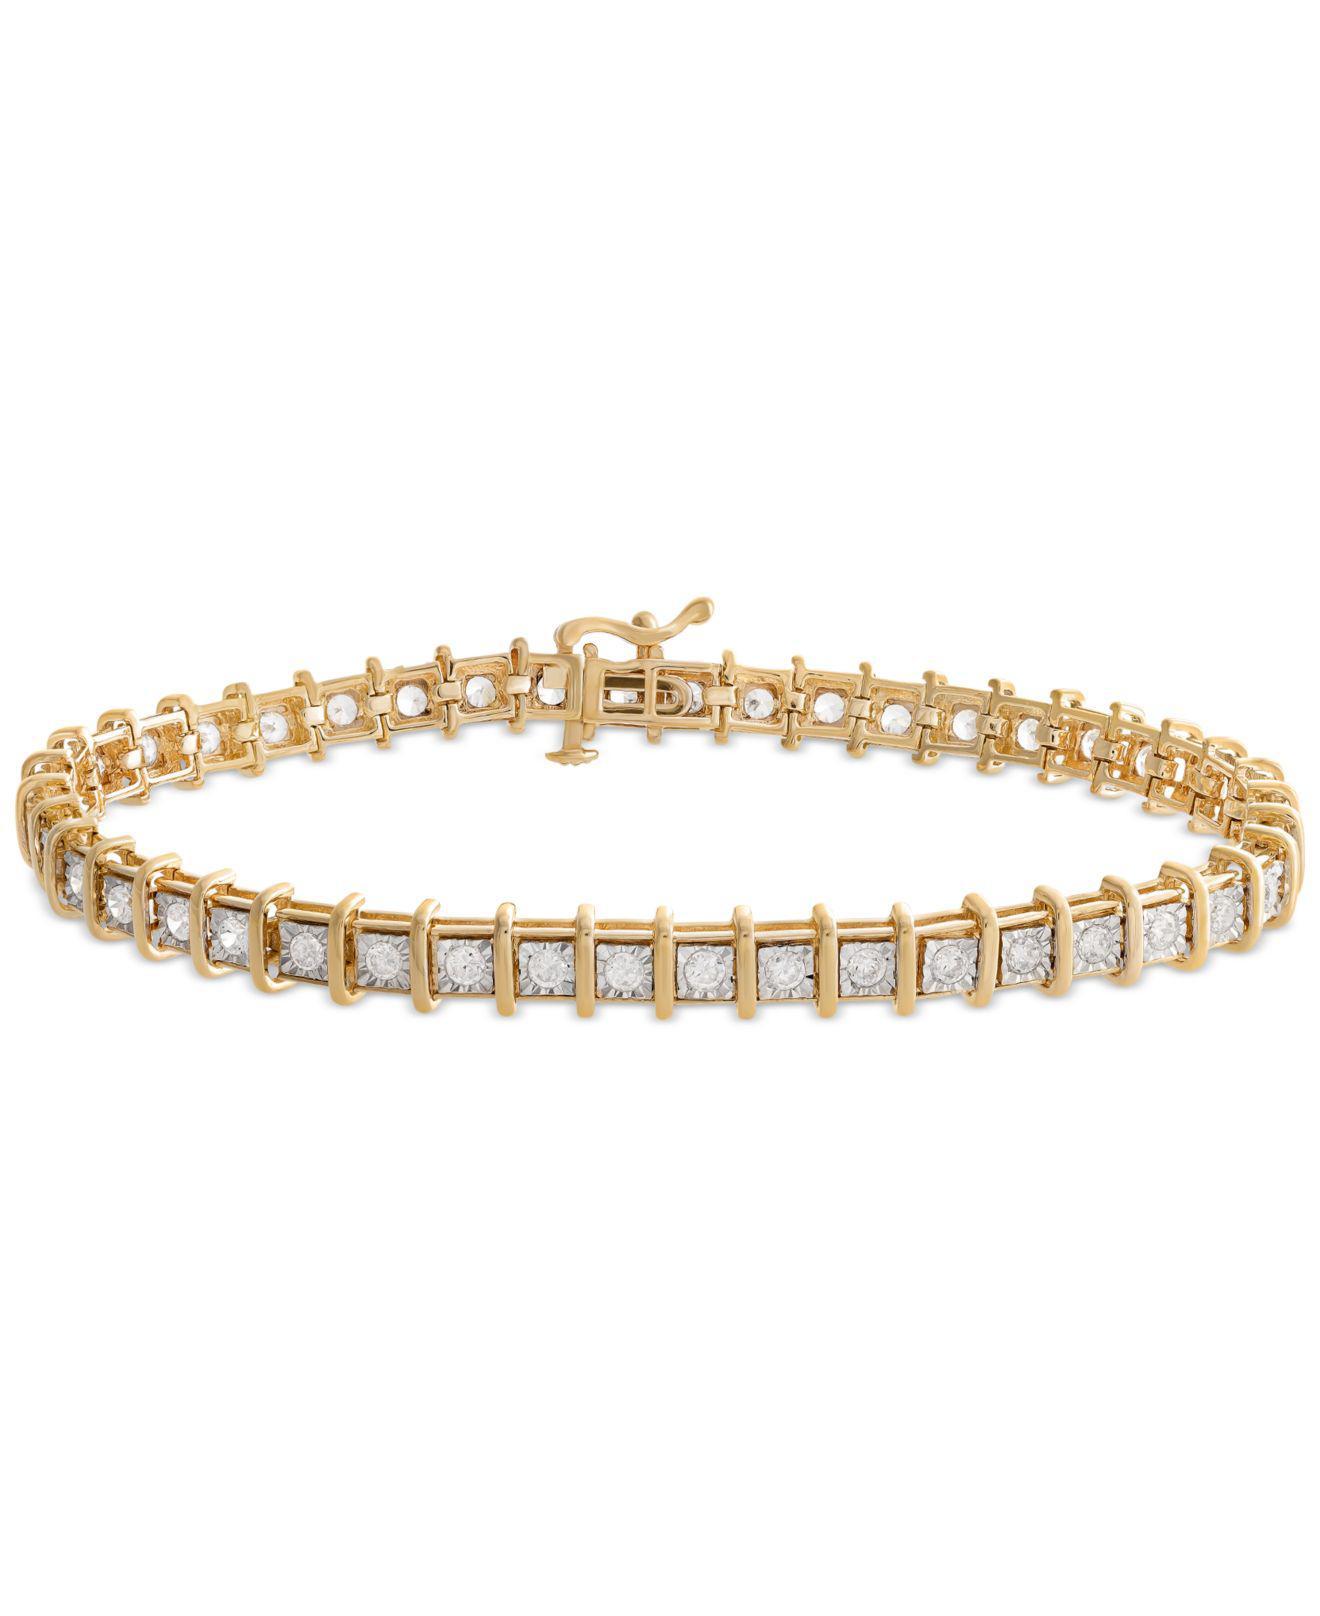 Diamond Tennis Bracelet 2 Ct T W In 14k Gold Rose Or White